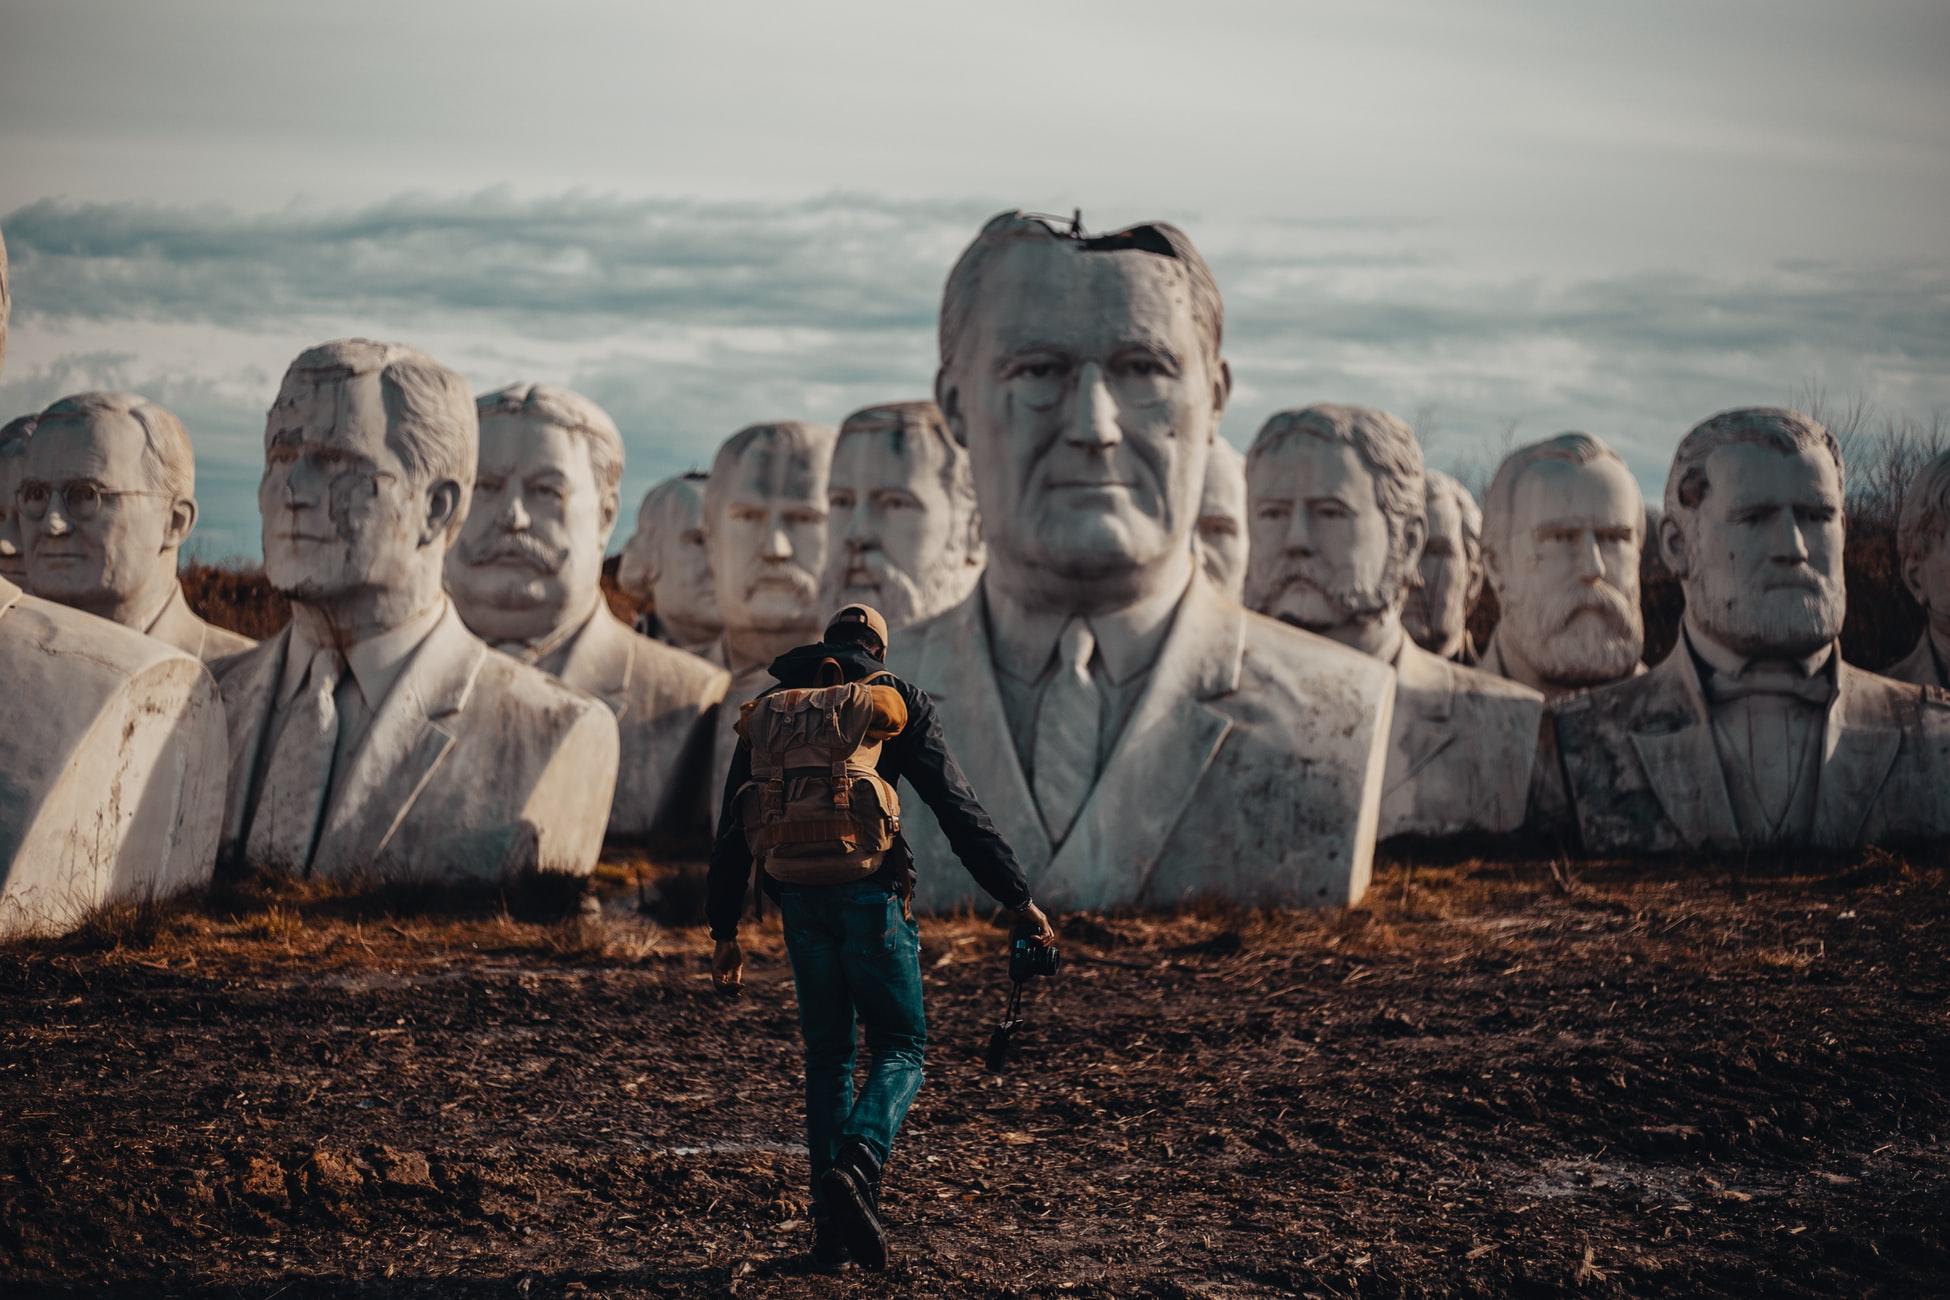 Bustos abandonados de expresidentes de Estados Unidos. Foto: Tobi Oluremi